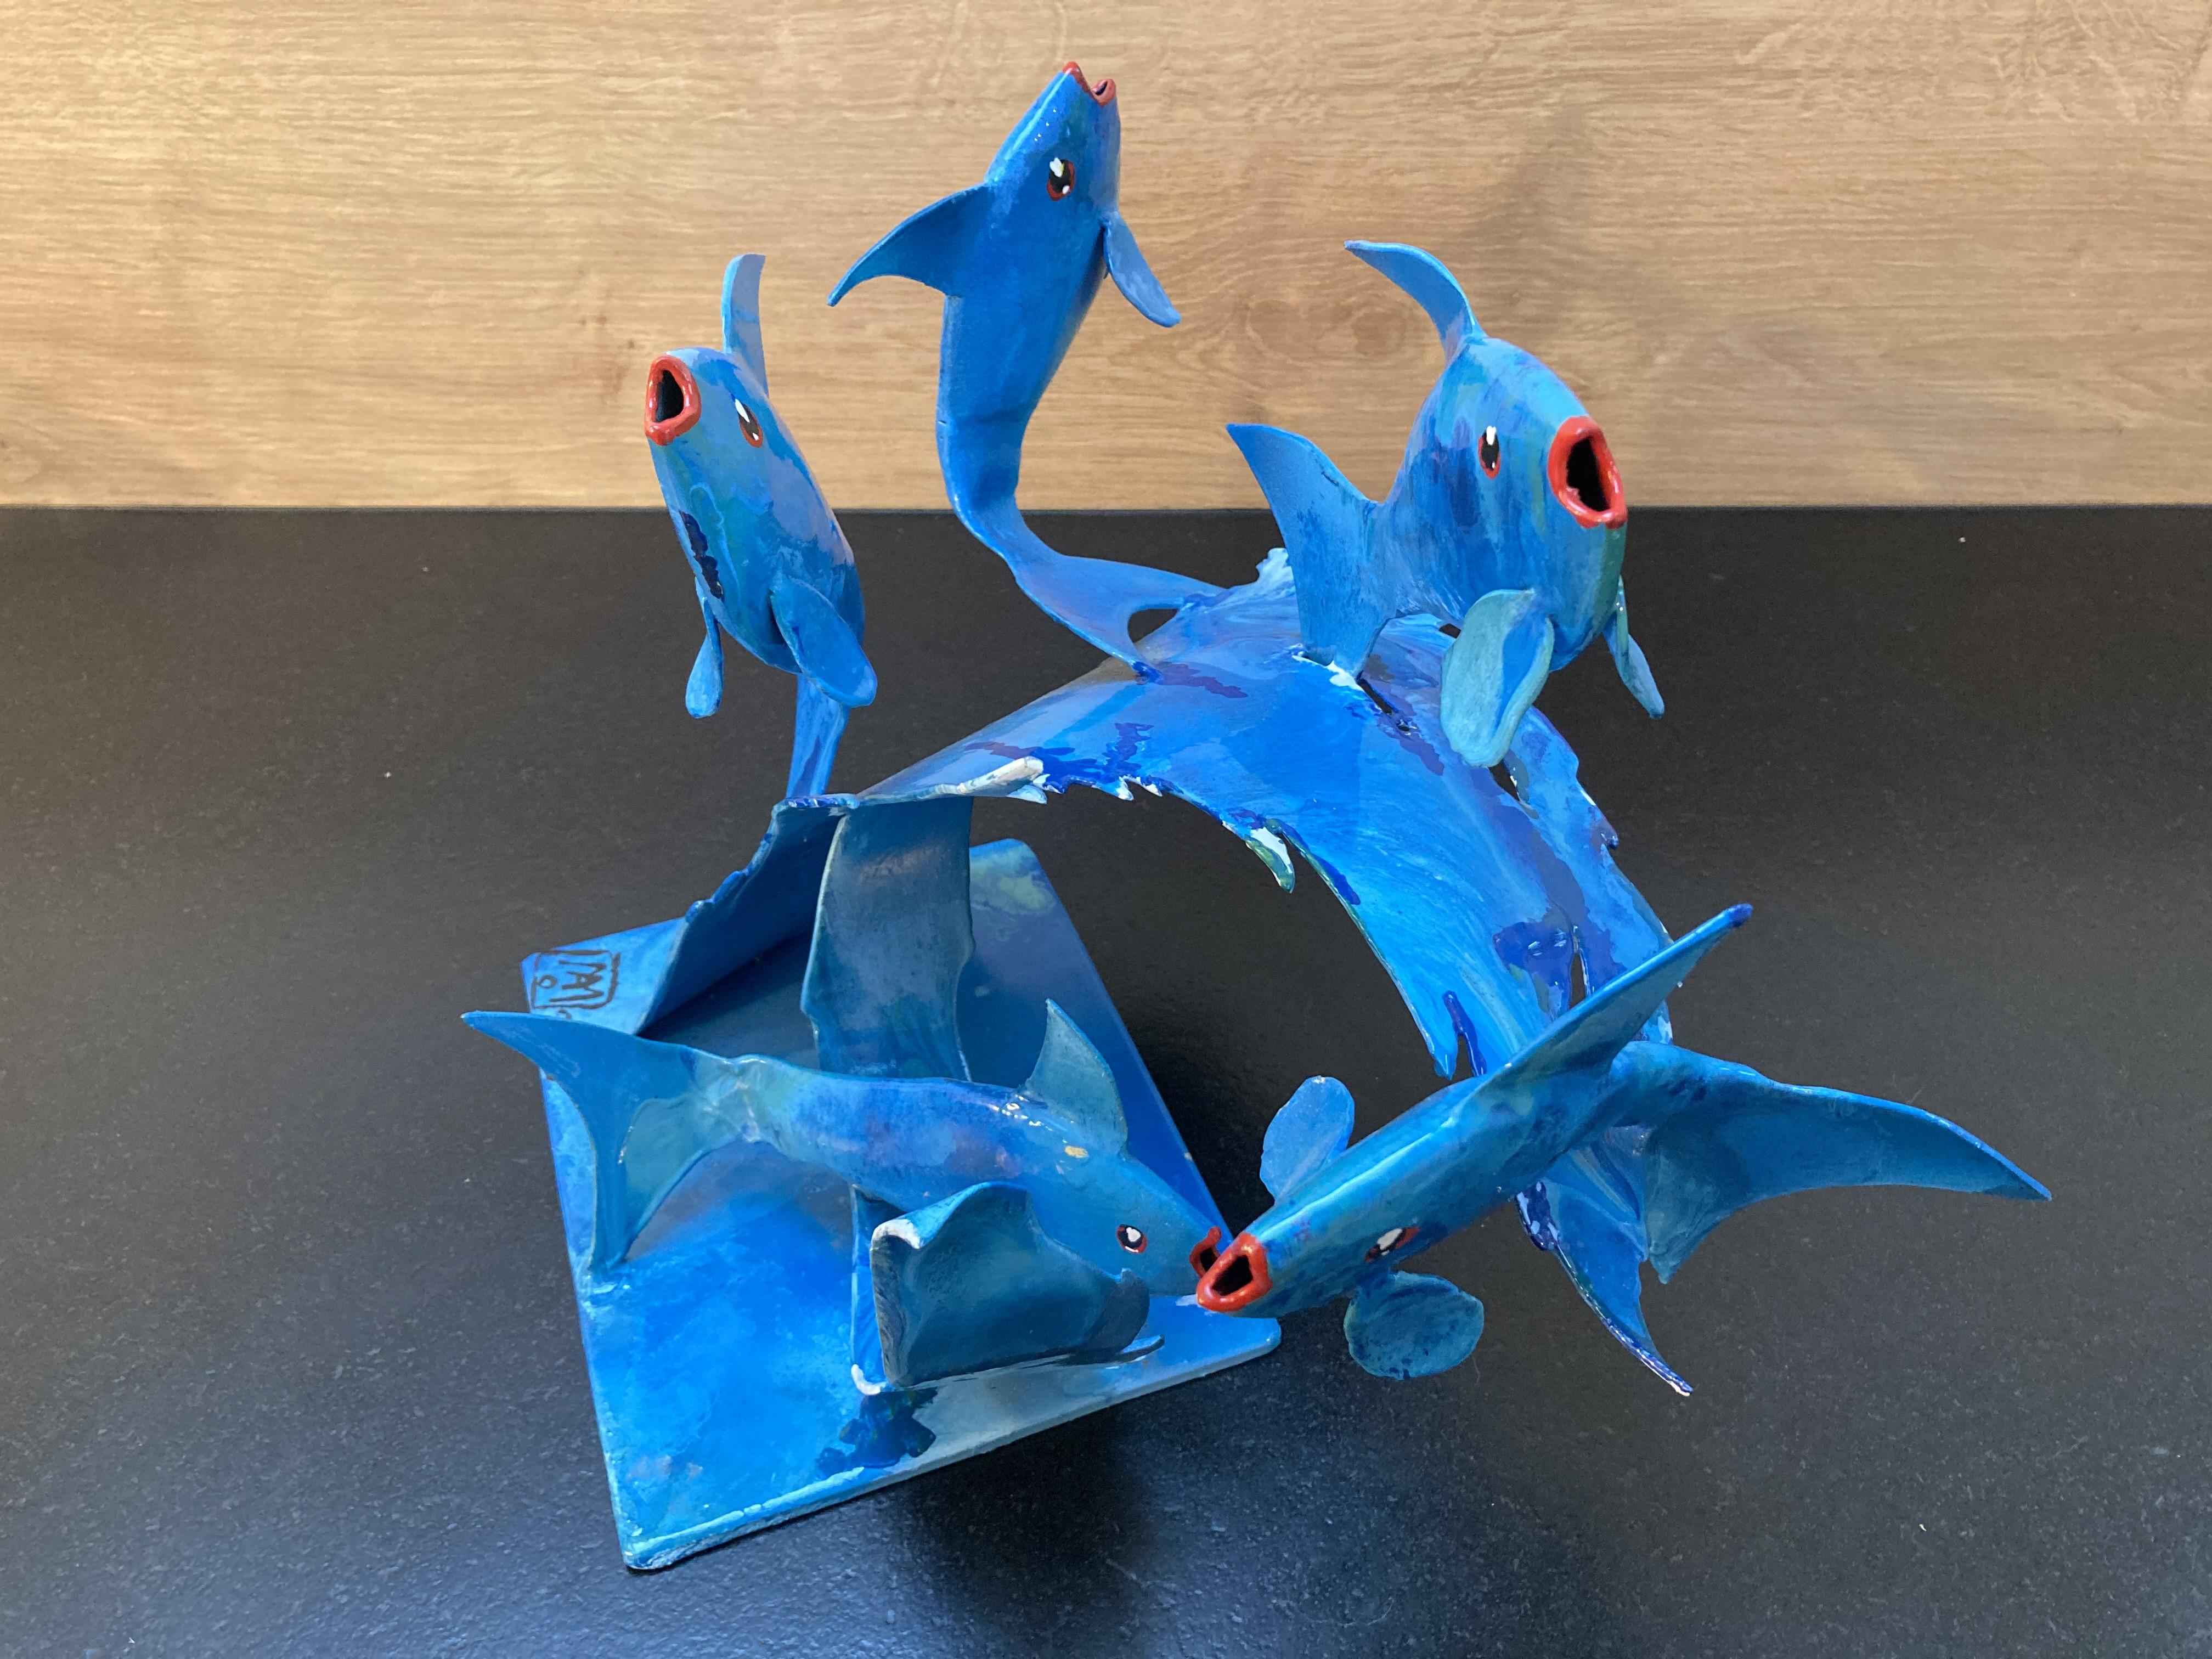 """Banc de poissons"" - n°211"